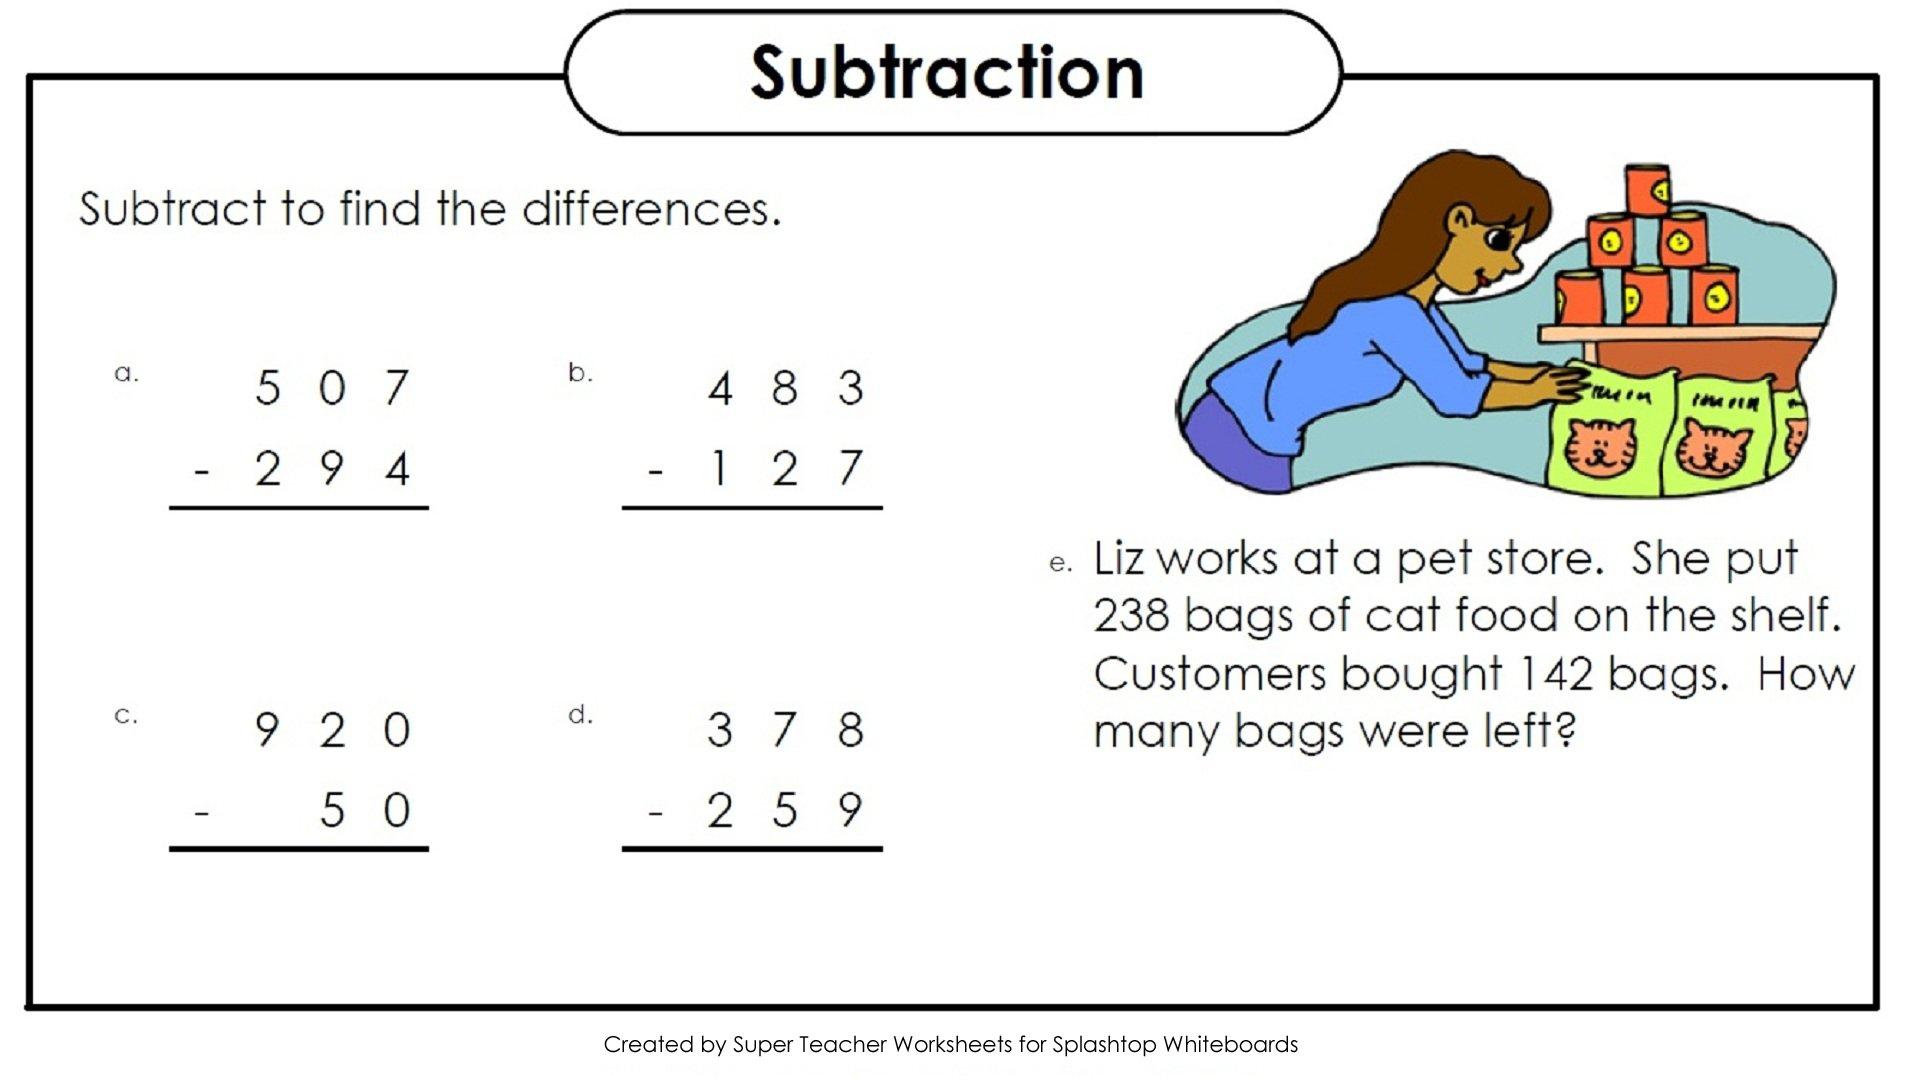 Splashtop Whiteboard Background Graphics With Super Teacher Worksheets Reading Comprehension